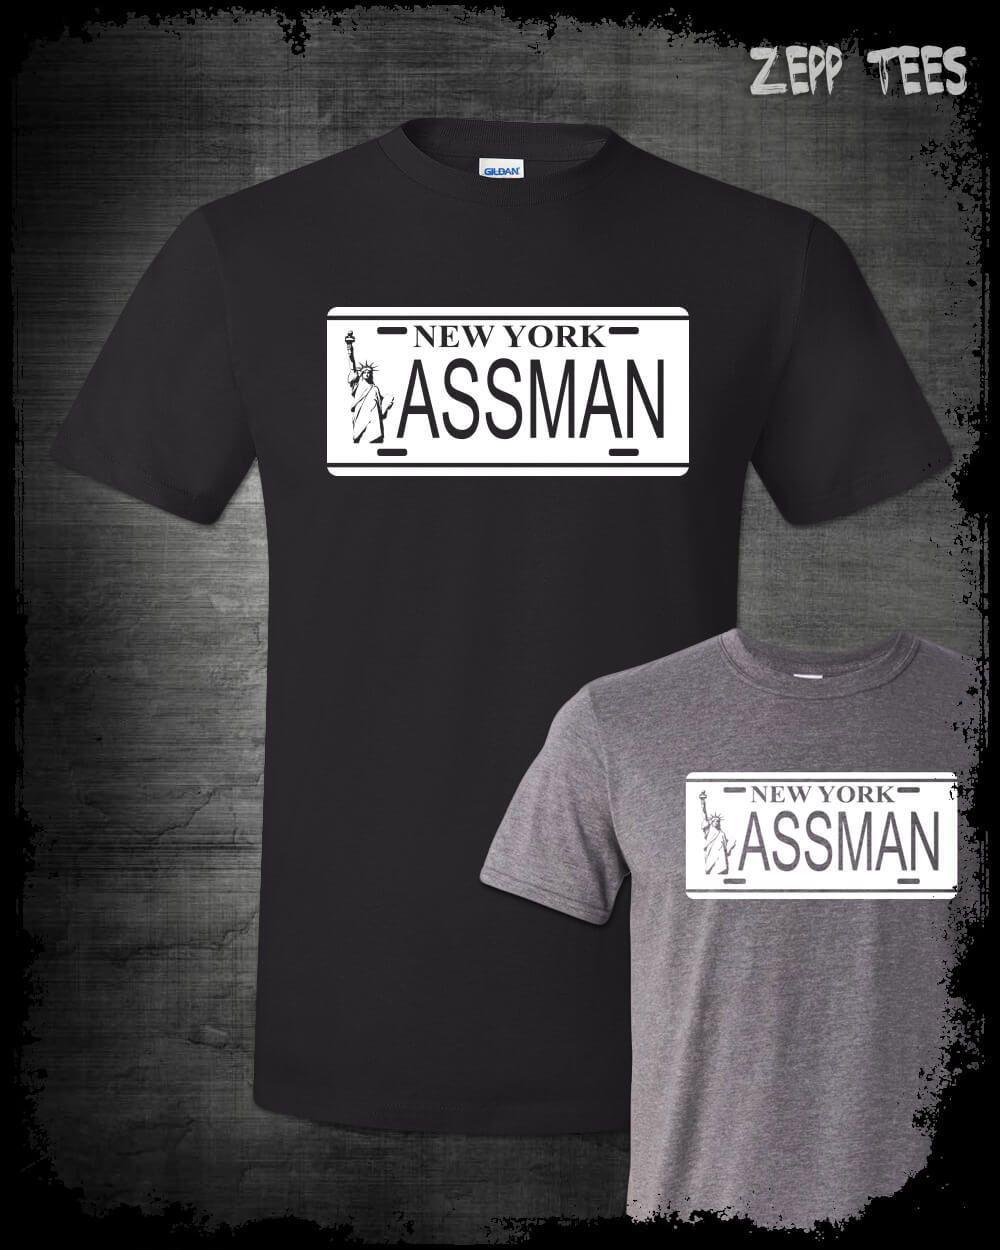 744da745 Kramer Assman Seinfeld T Shirt. Kramerica Industries, George Costanza,  Funny TV Tee Shirts Sale Designable T Shirts From Pickapair, $12.96|  DHgate.Com